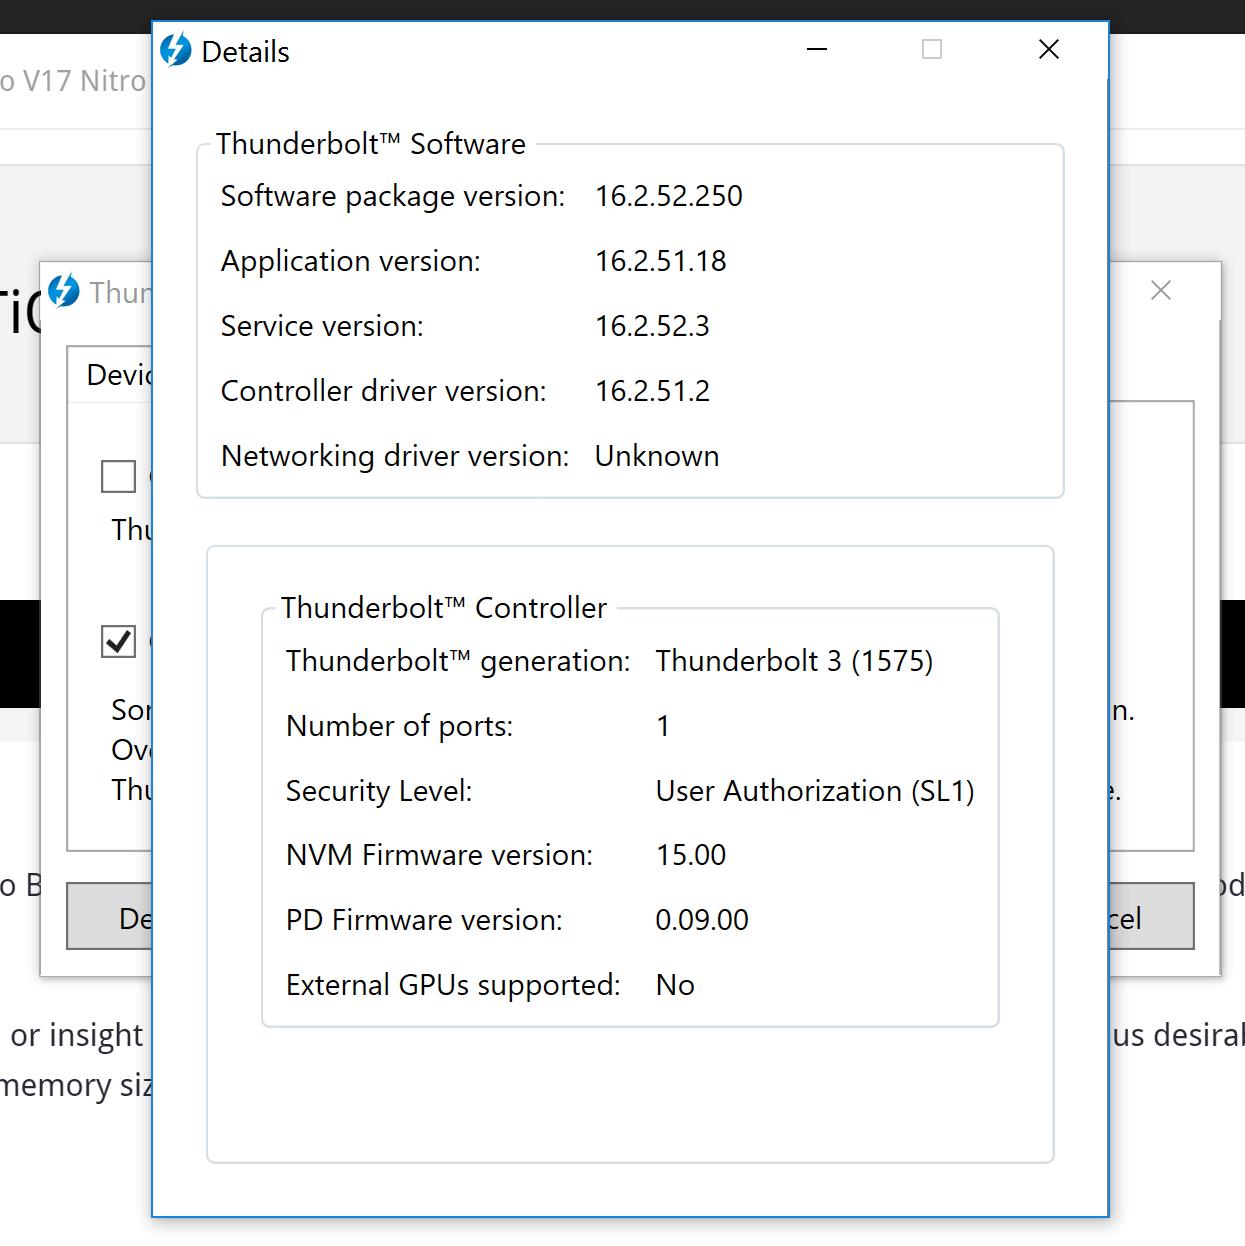 V15 Nitro TB3 eGPU possible? — Acer Community